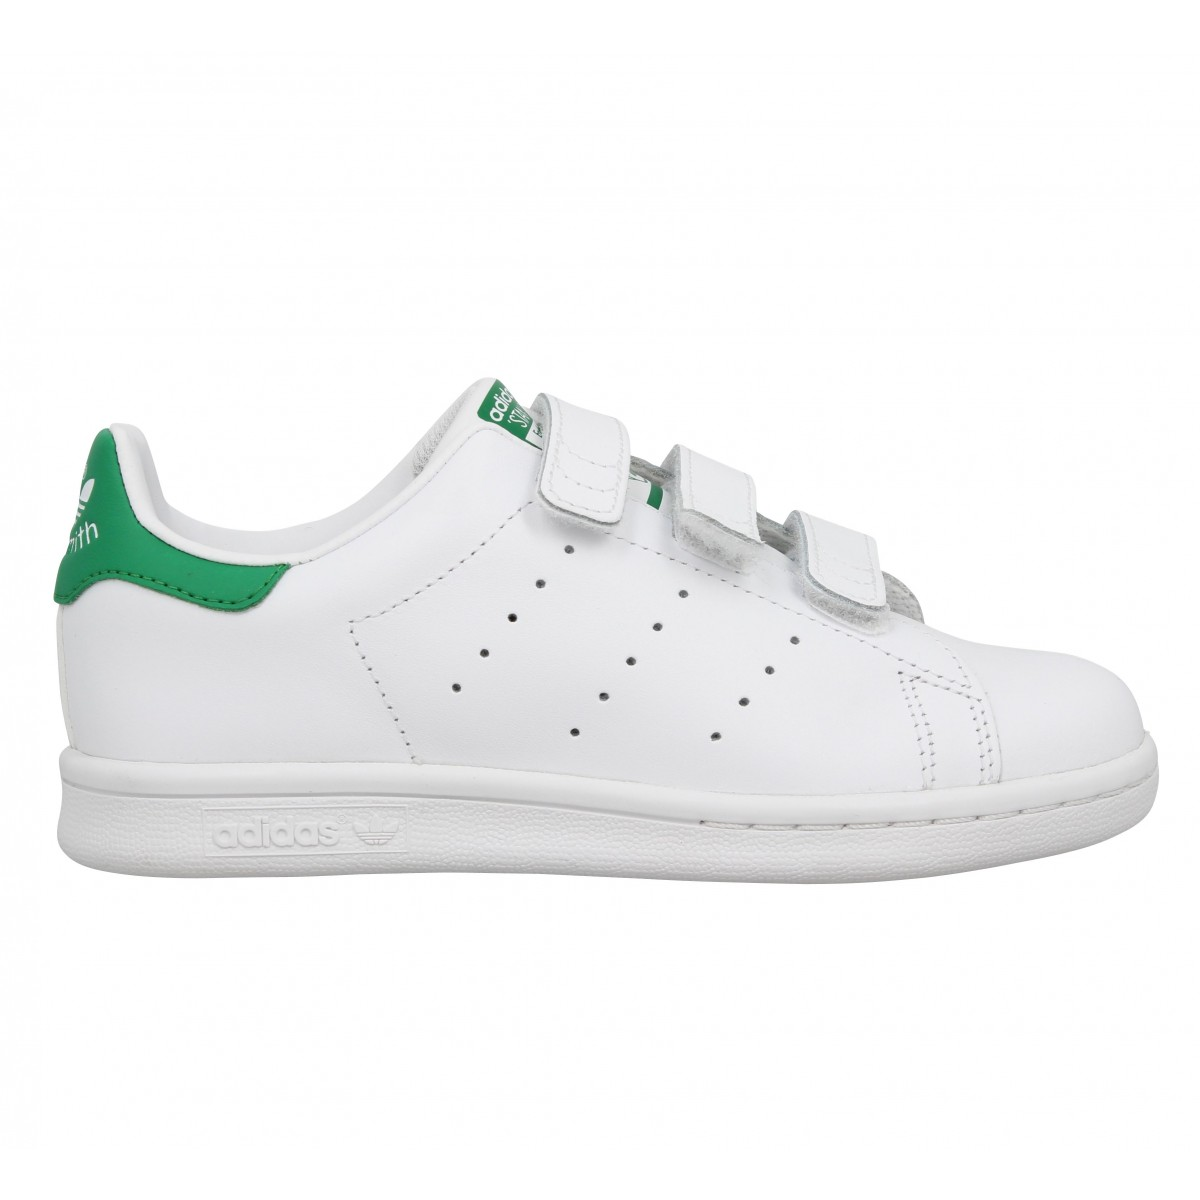 check out 4af60 3e295 Chaussures Adidas stan smith ii cuir enfant blanc vert  Fann